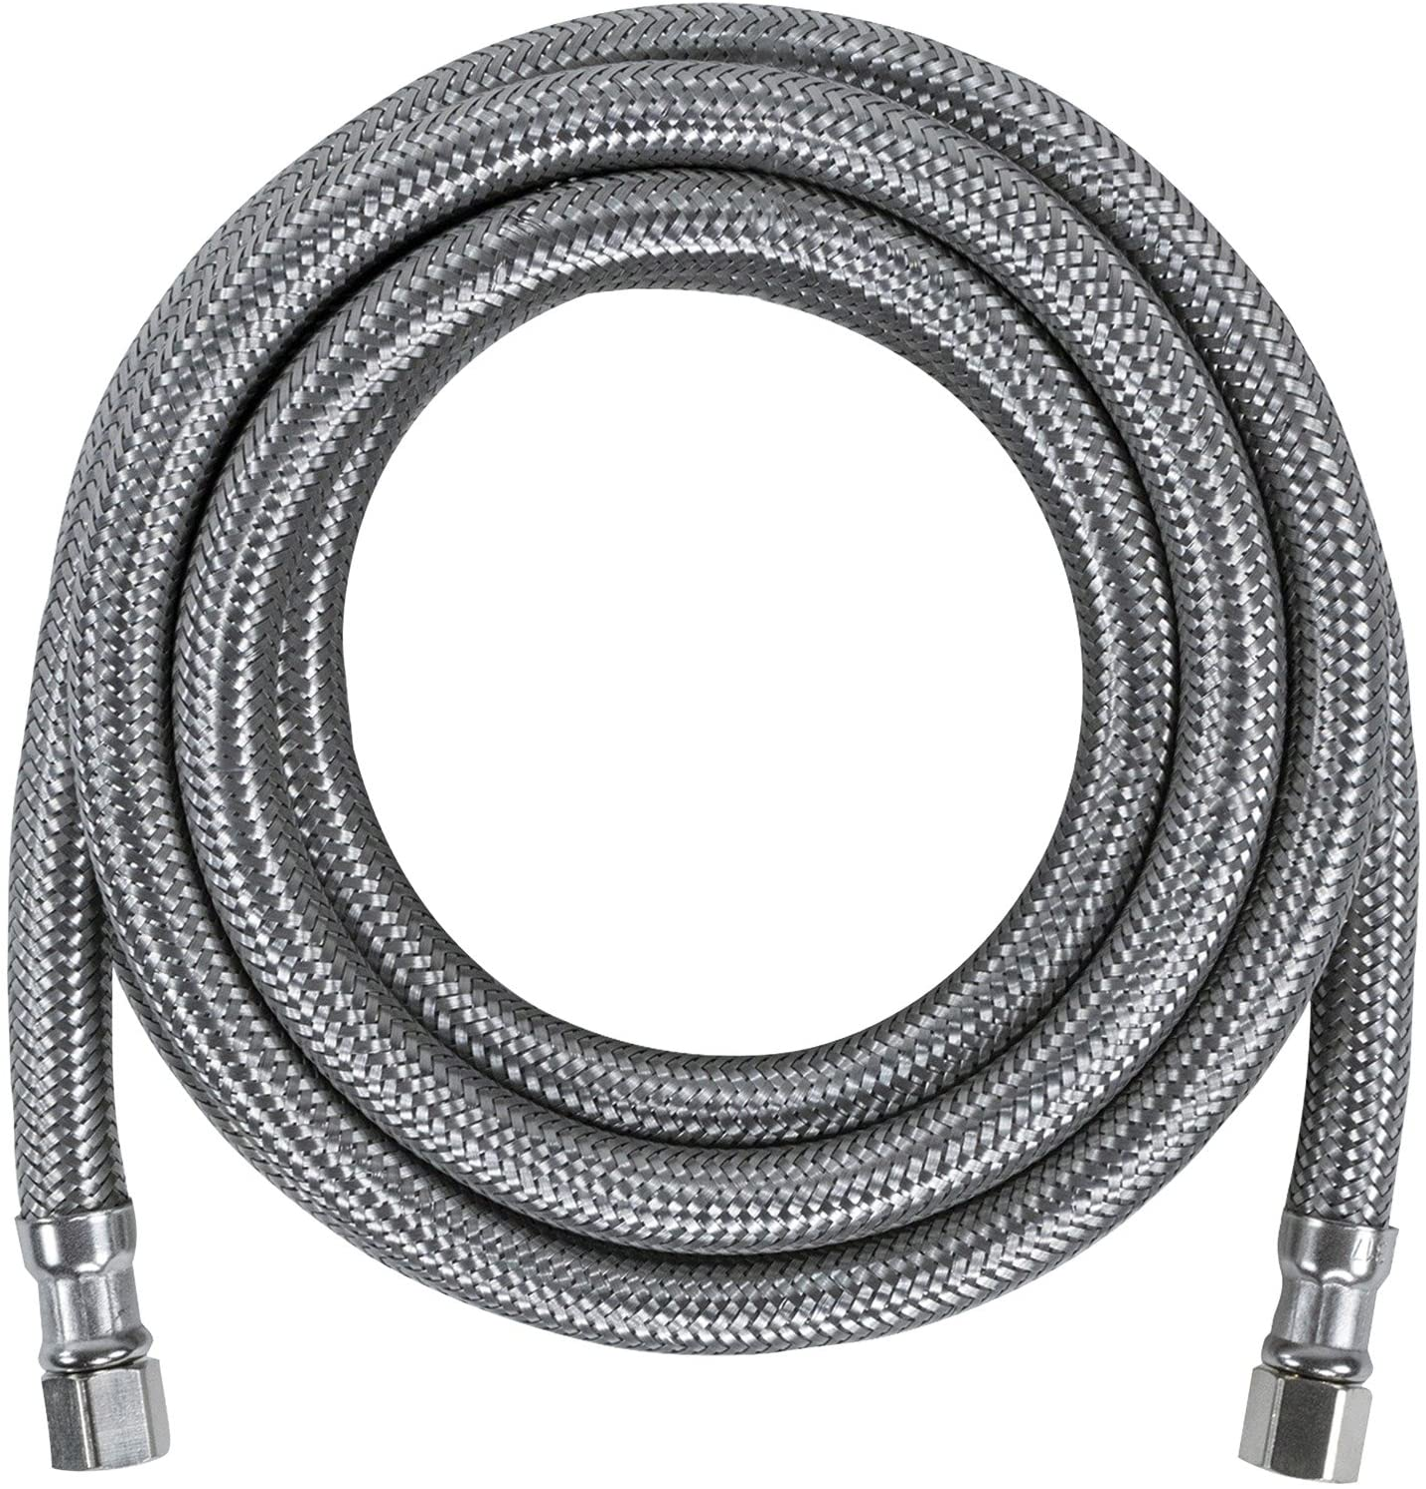 10 Feet Ice Maker Water Line Premium Braided Stainless Steel